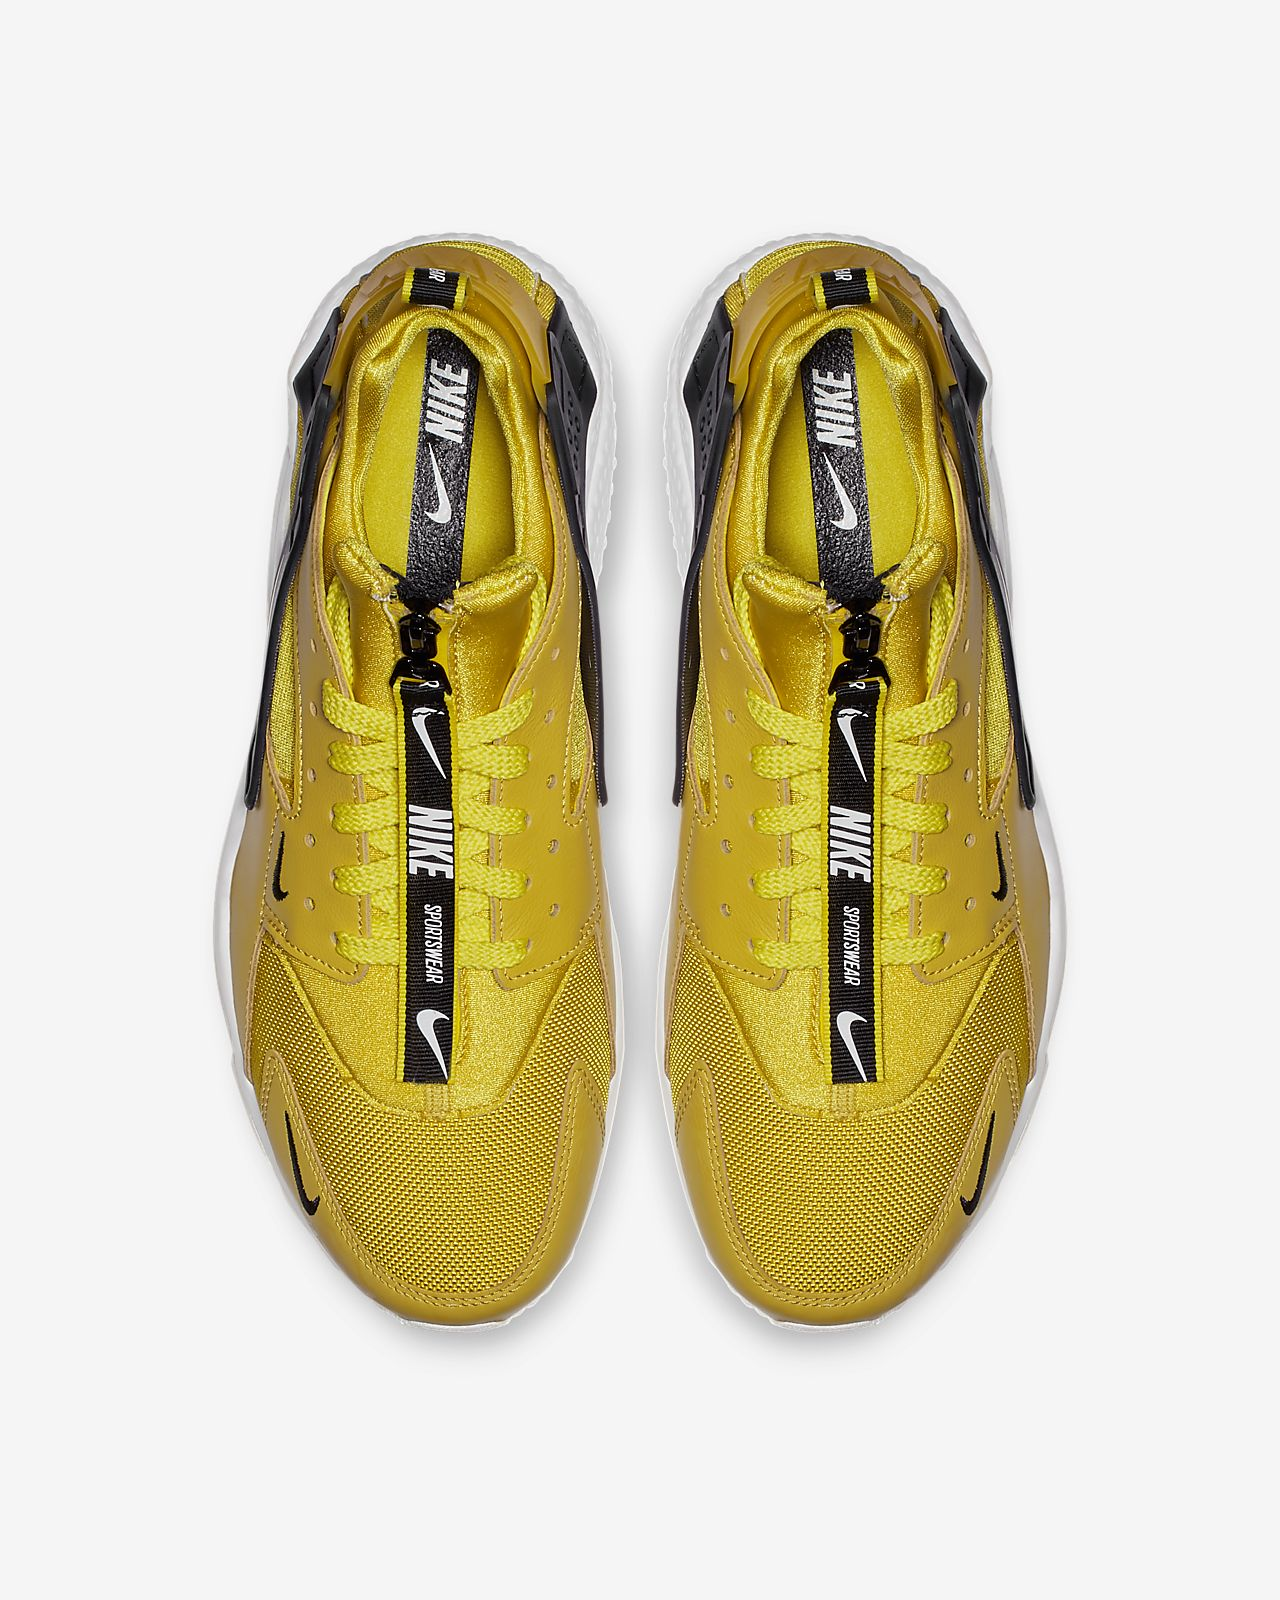 brand new 162e1 96efc ... Nike Air Huarache Run Premium Zip Men s Shoe